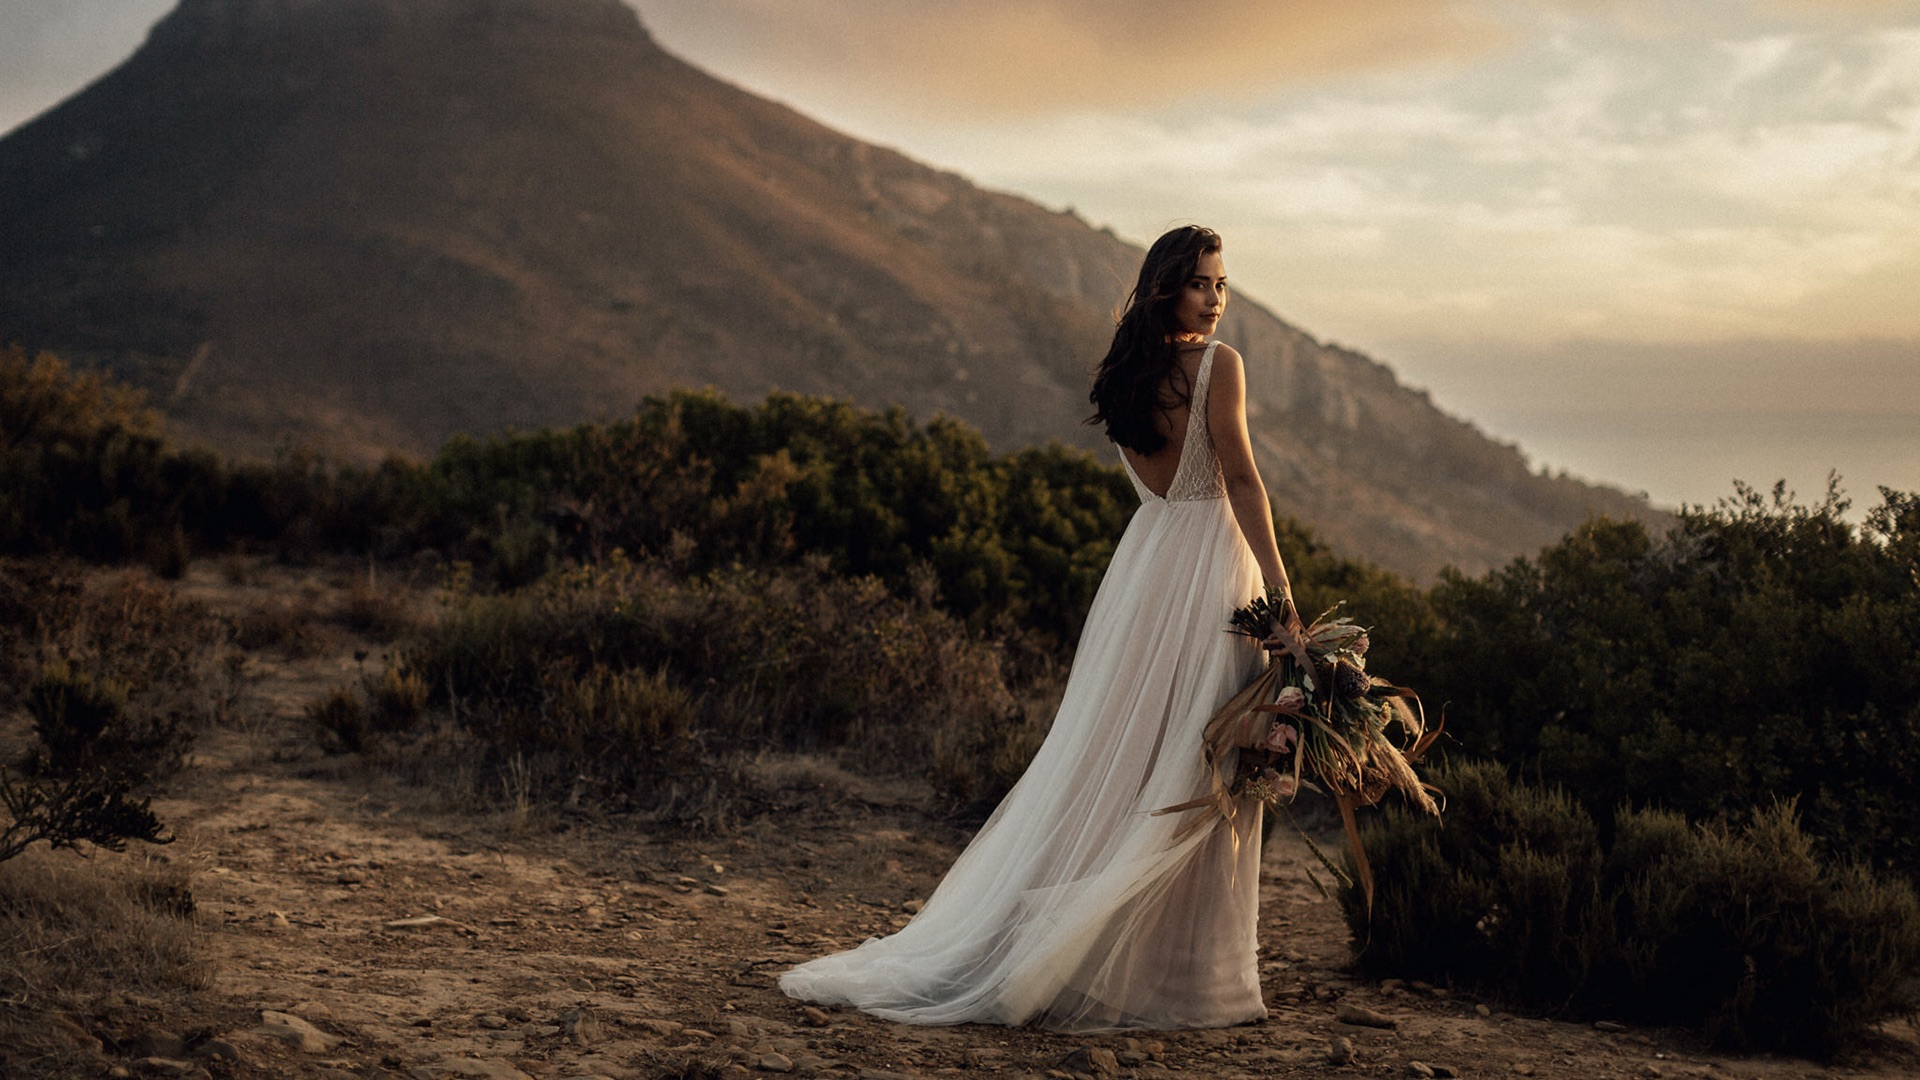 12 wedding photographers to follow on 500px